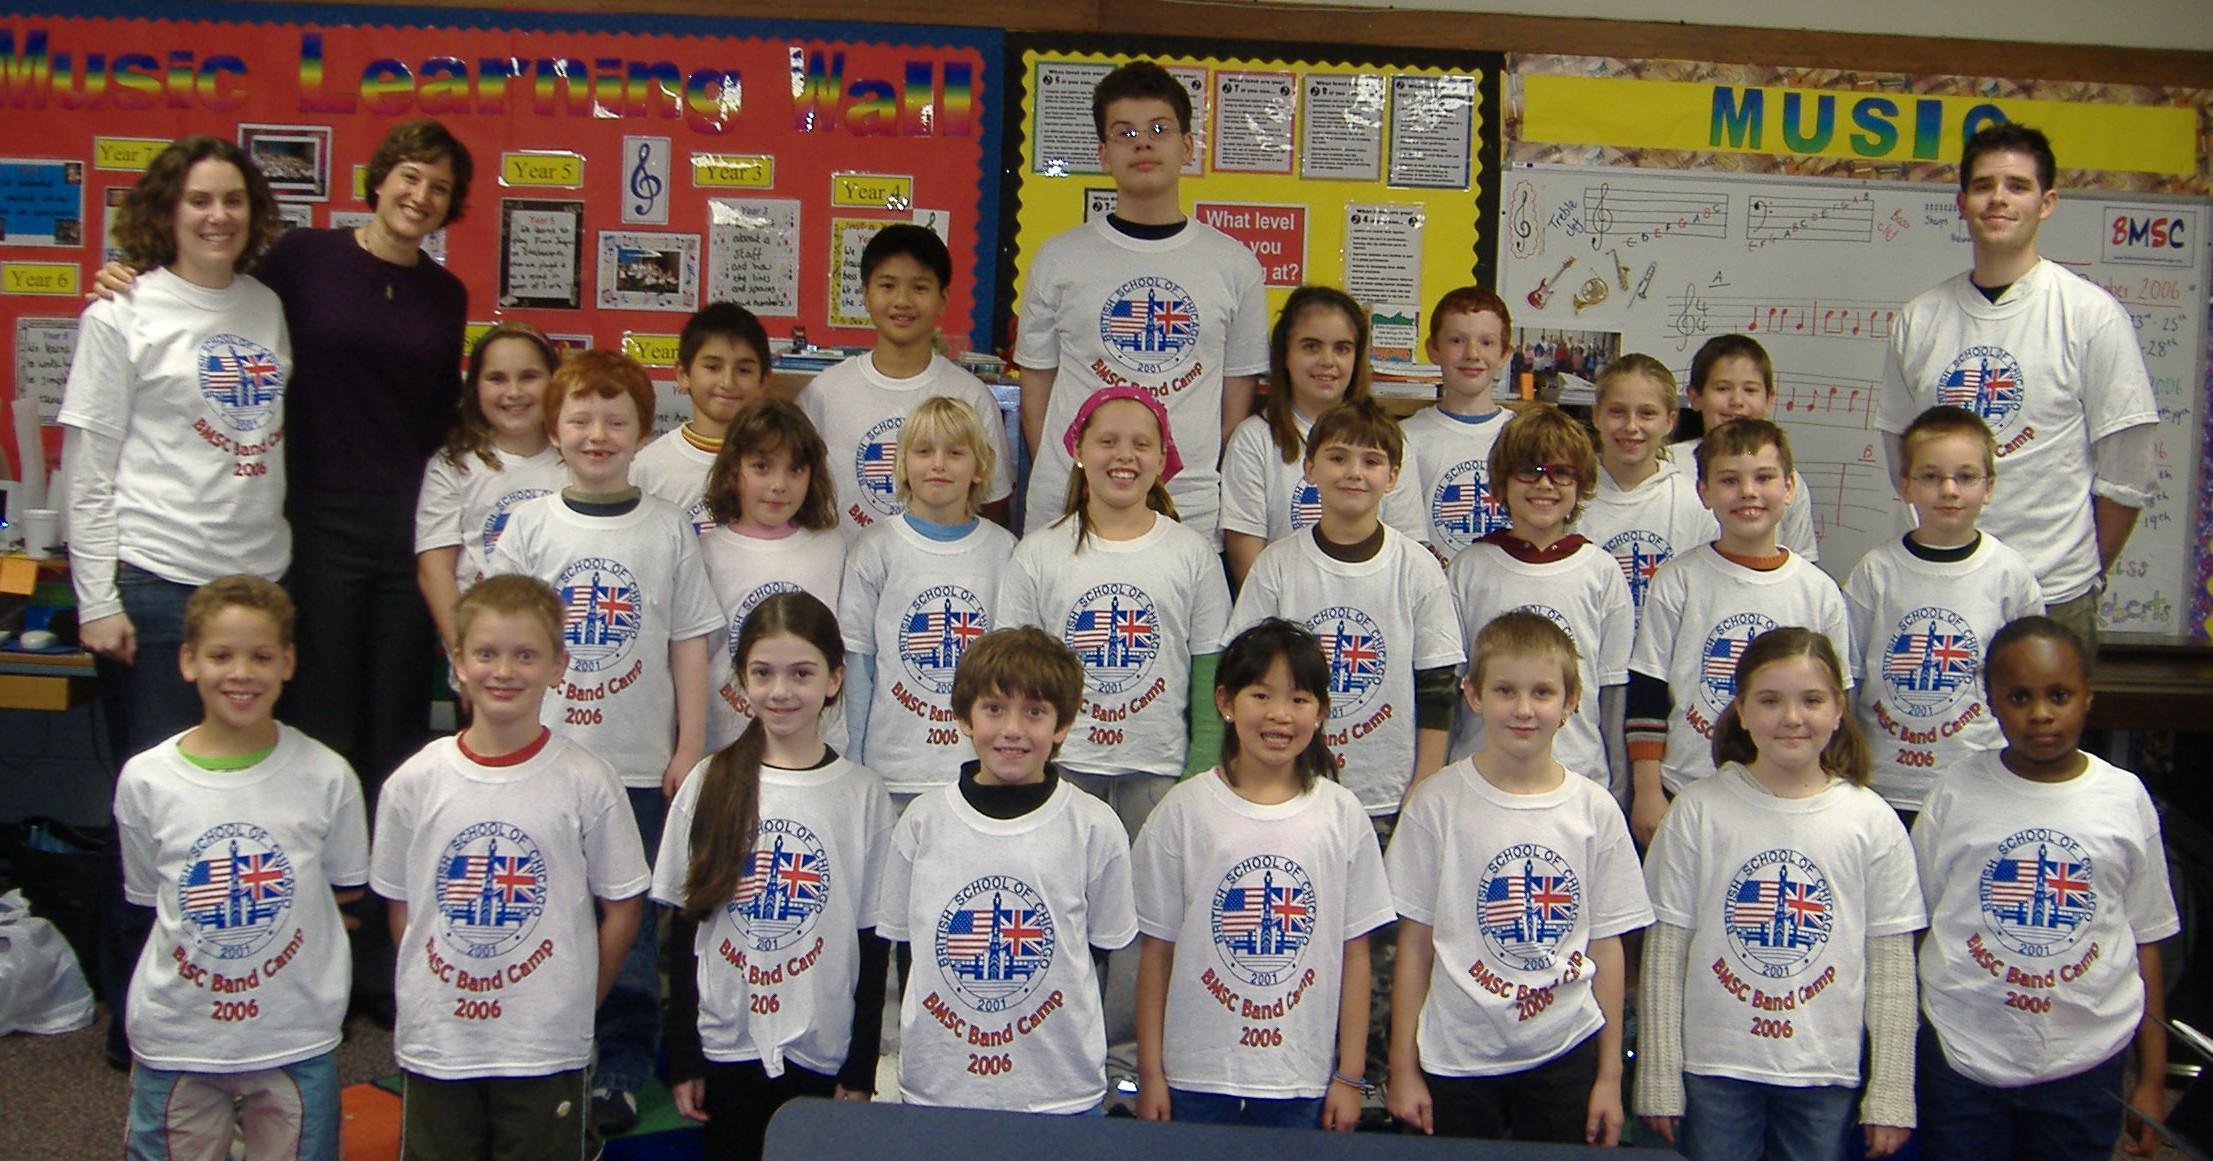 Design your own t shirt chicago - British Music School Of Chicago T Shirt Photo